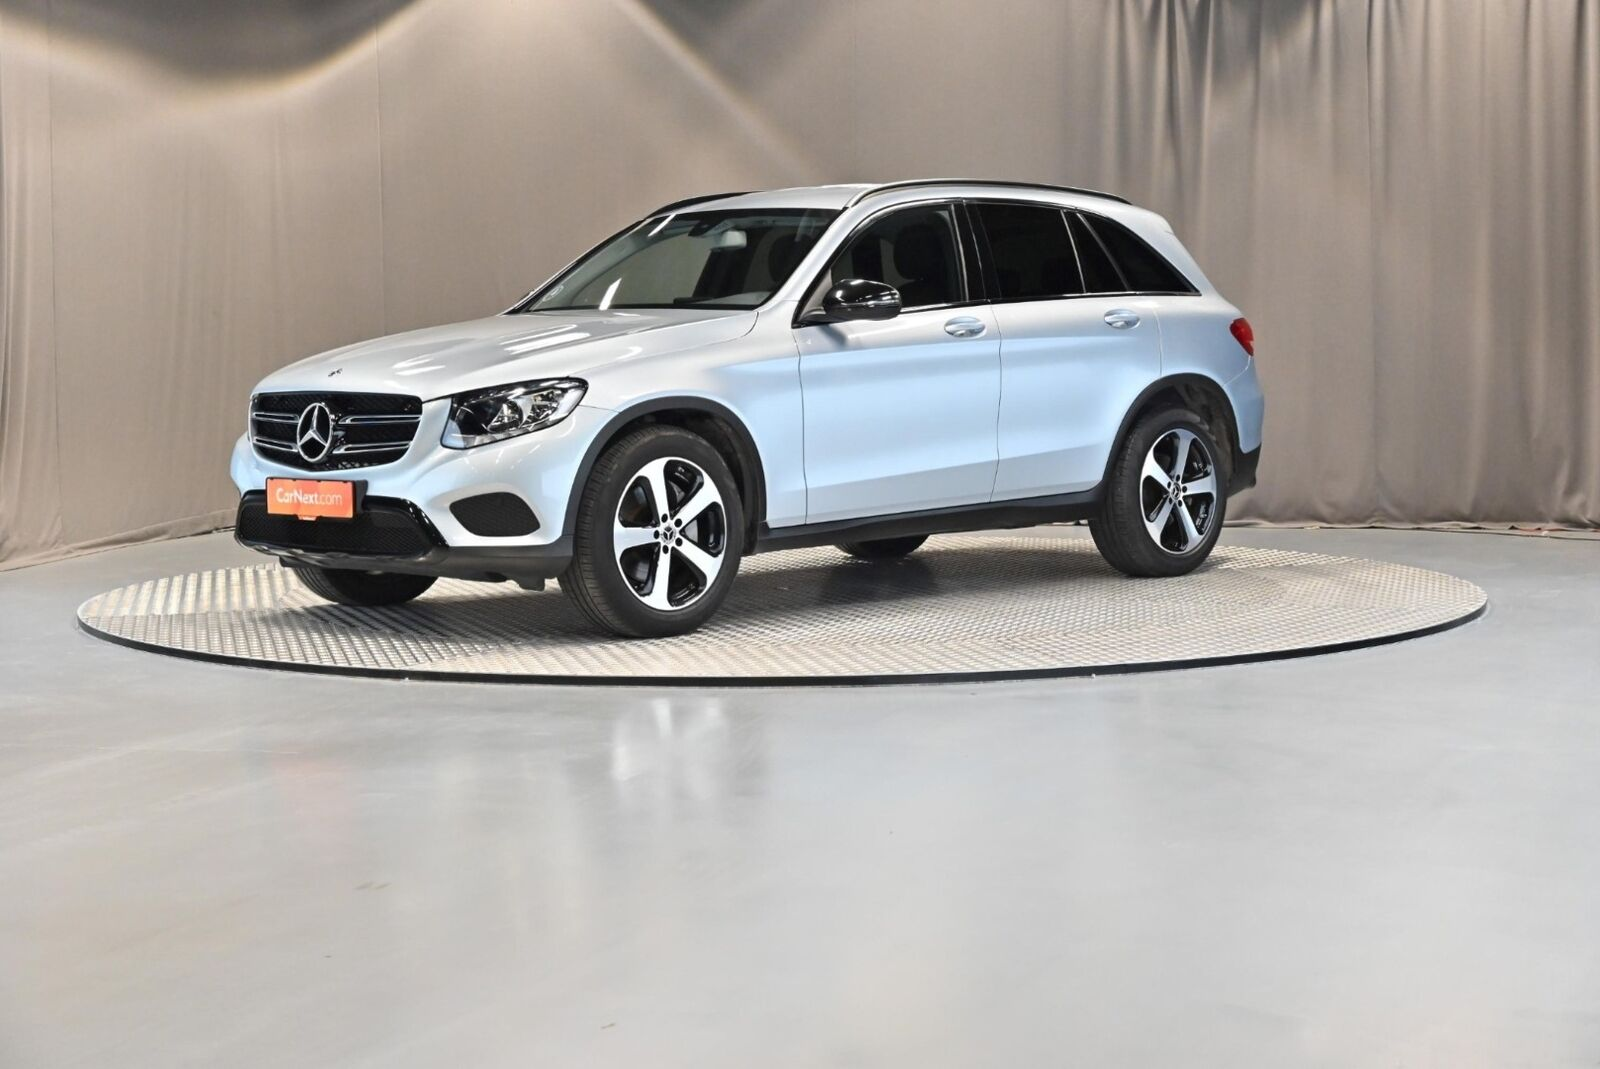 Mercedes GLC220 d 2,2 aut. 4Matic 5d - 399.900 kr.